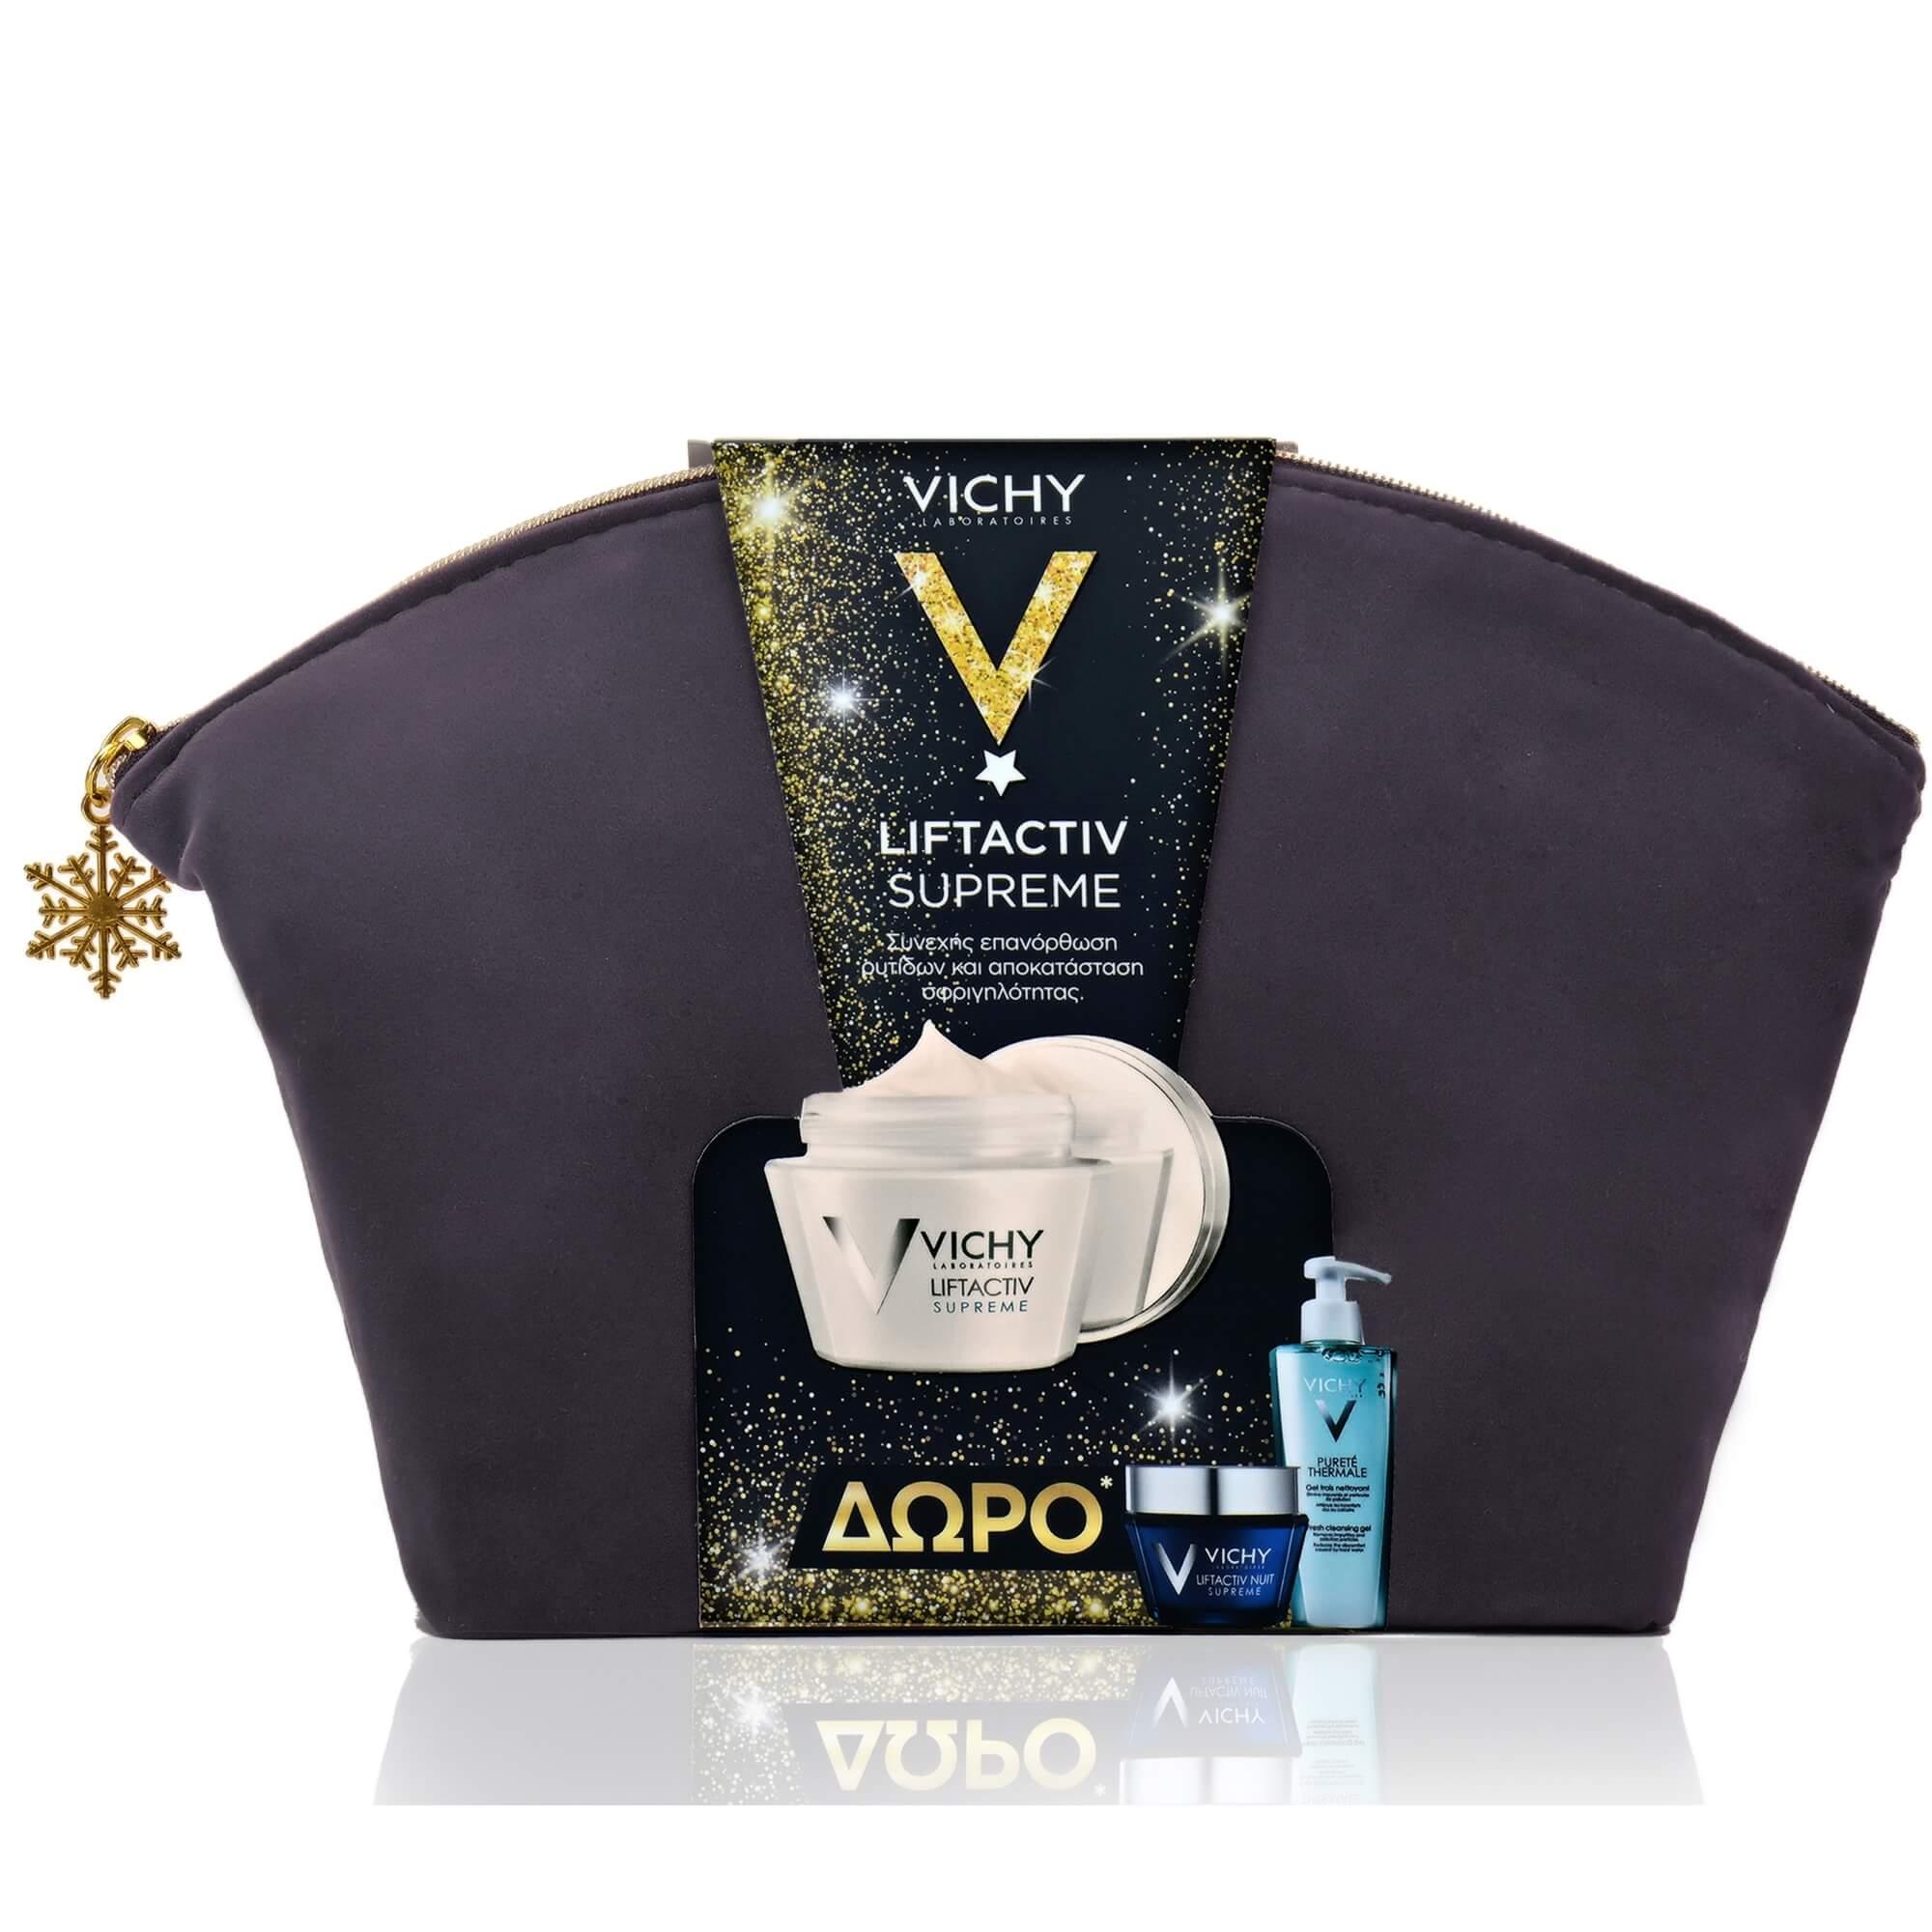 Vichy Πακέτο Προσφοράς Liftactiv Supreme, Καν / Μικτή Επιδερμίδα 50ml& Δώρο Neovadiol Nuit 15ml & Purete Thermale Gel 15ml